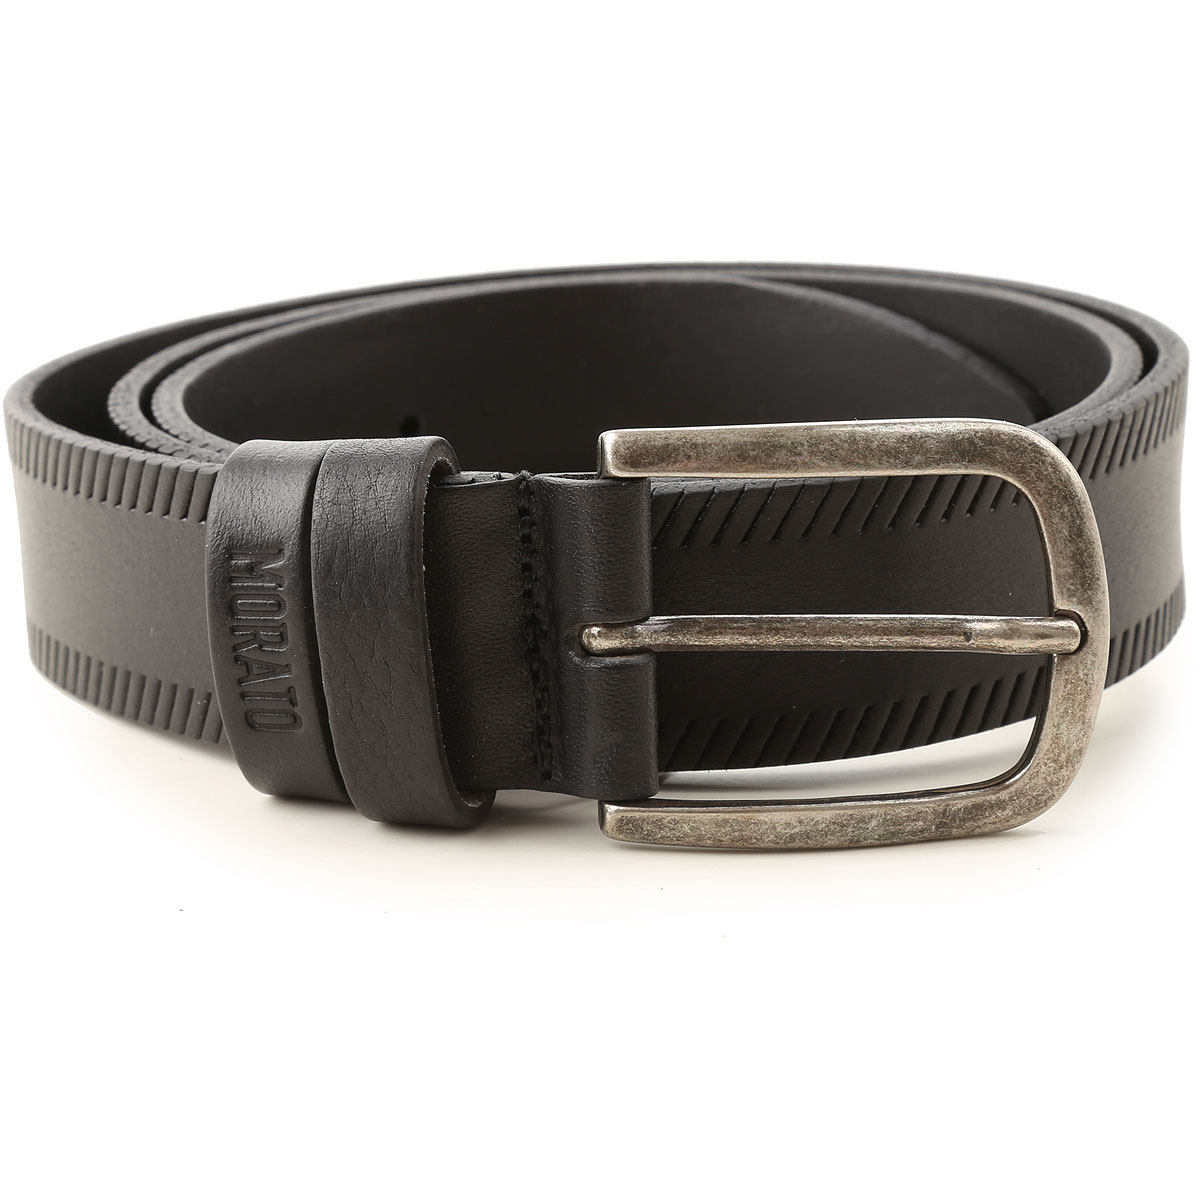 Antony Morato Belts On Sale, Black, Leather, 2019, S L XL